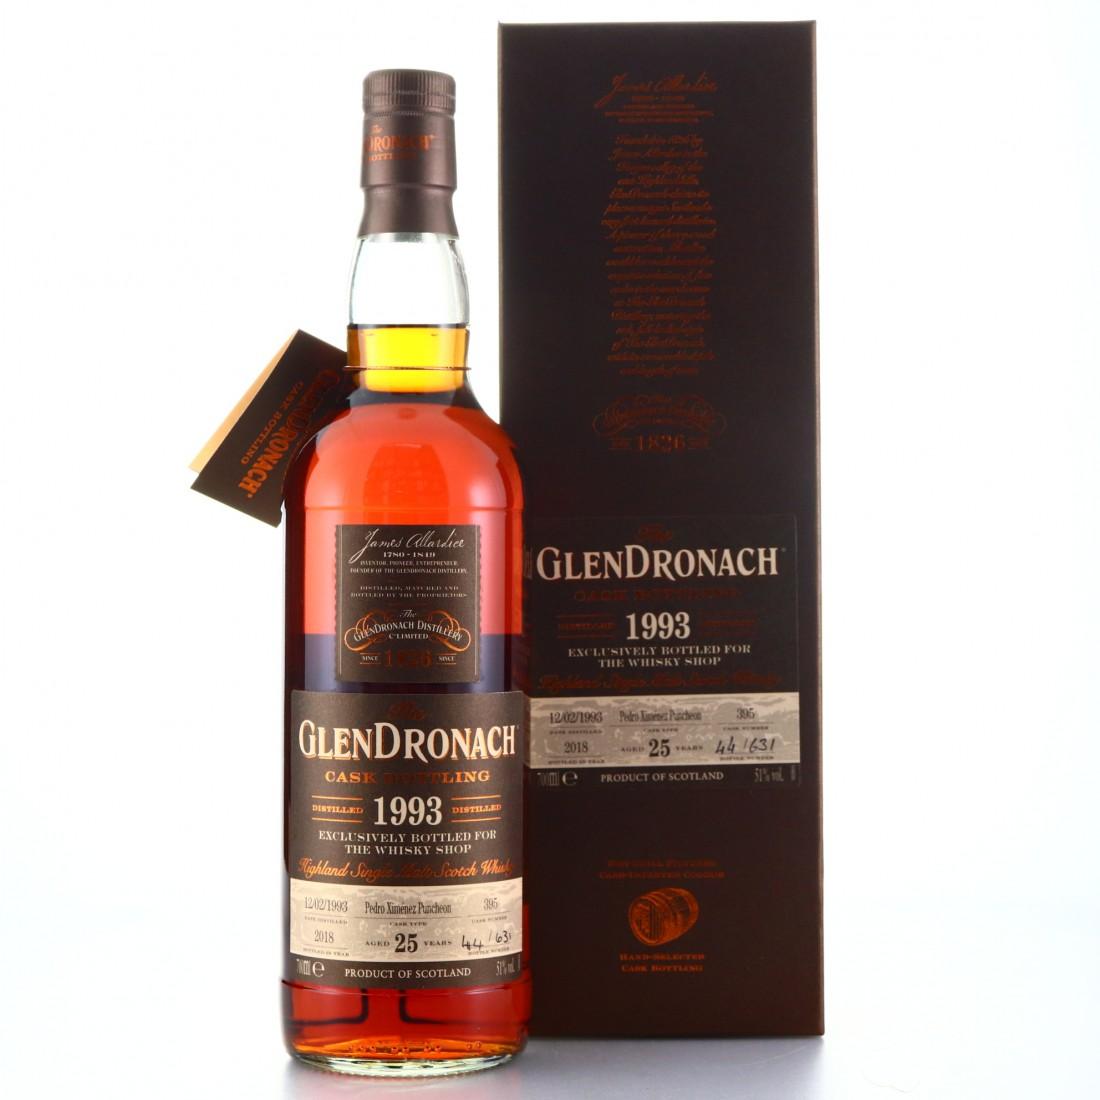 Glendronach 1993 Single PX Cask 25 Year Old #395 / TWS